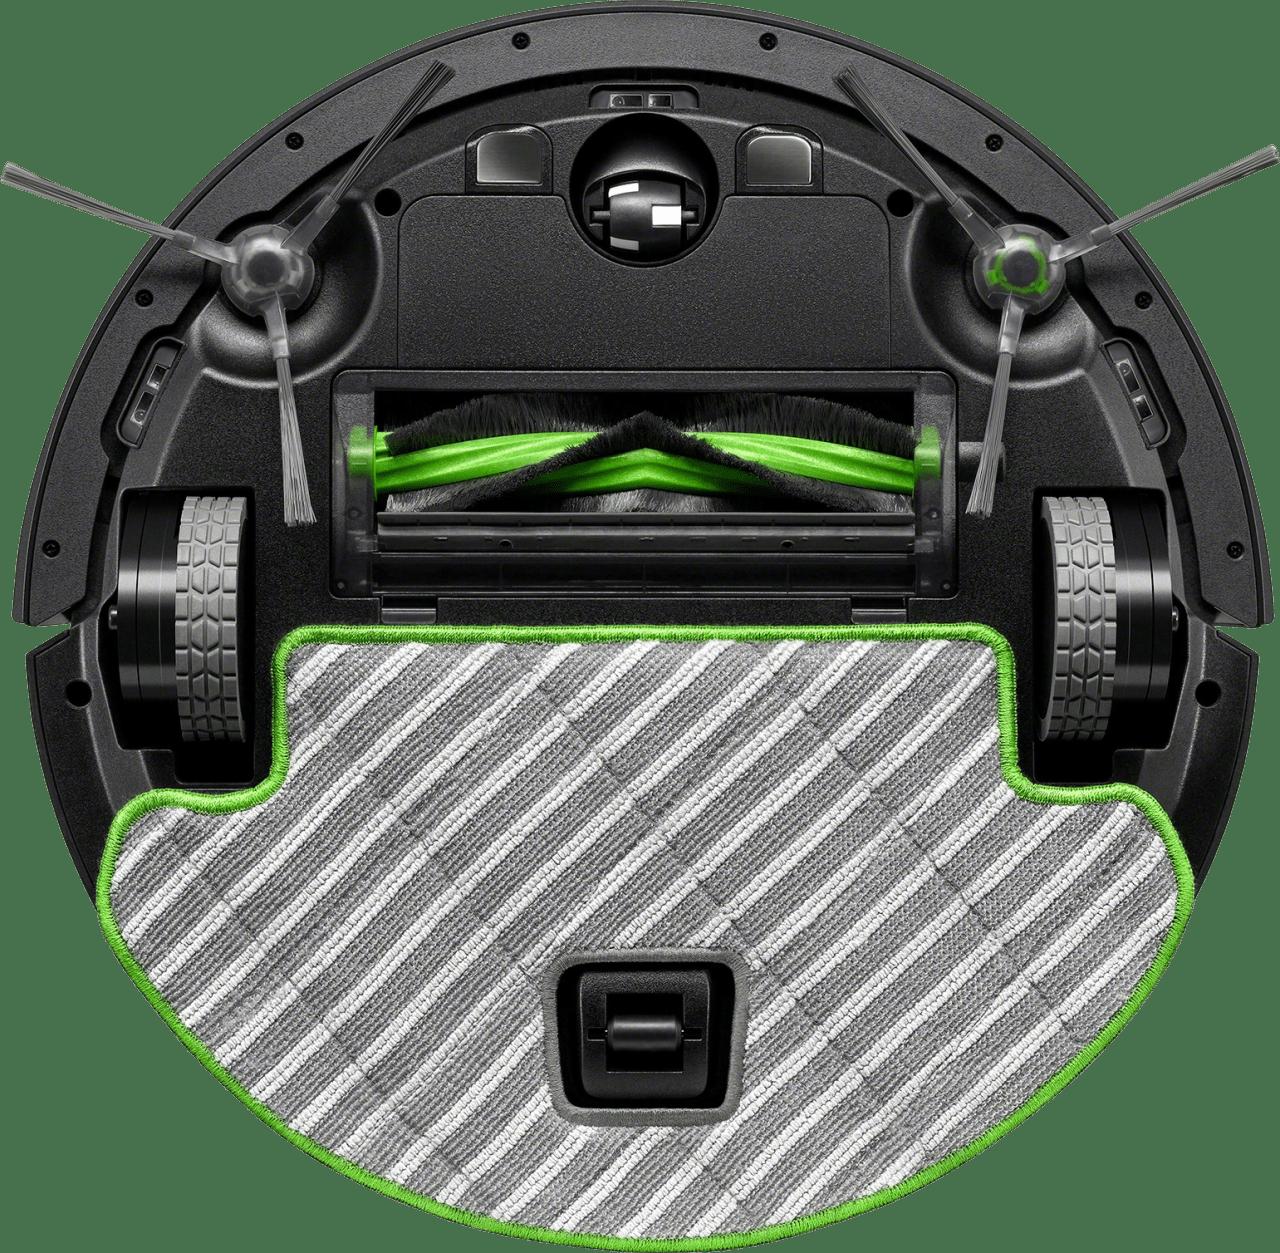 Grau iRobot Roomba Combo Saugroboter mit Wischfunktion.2